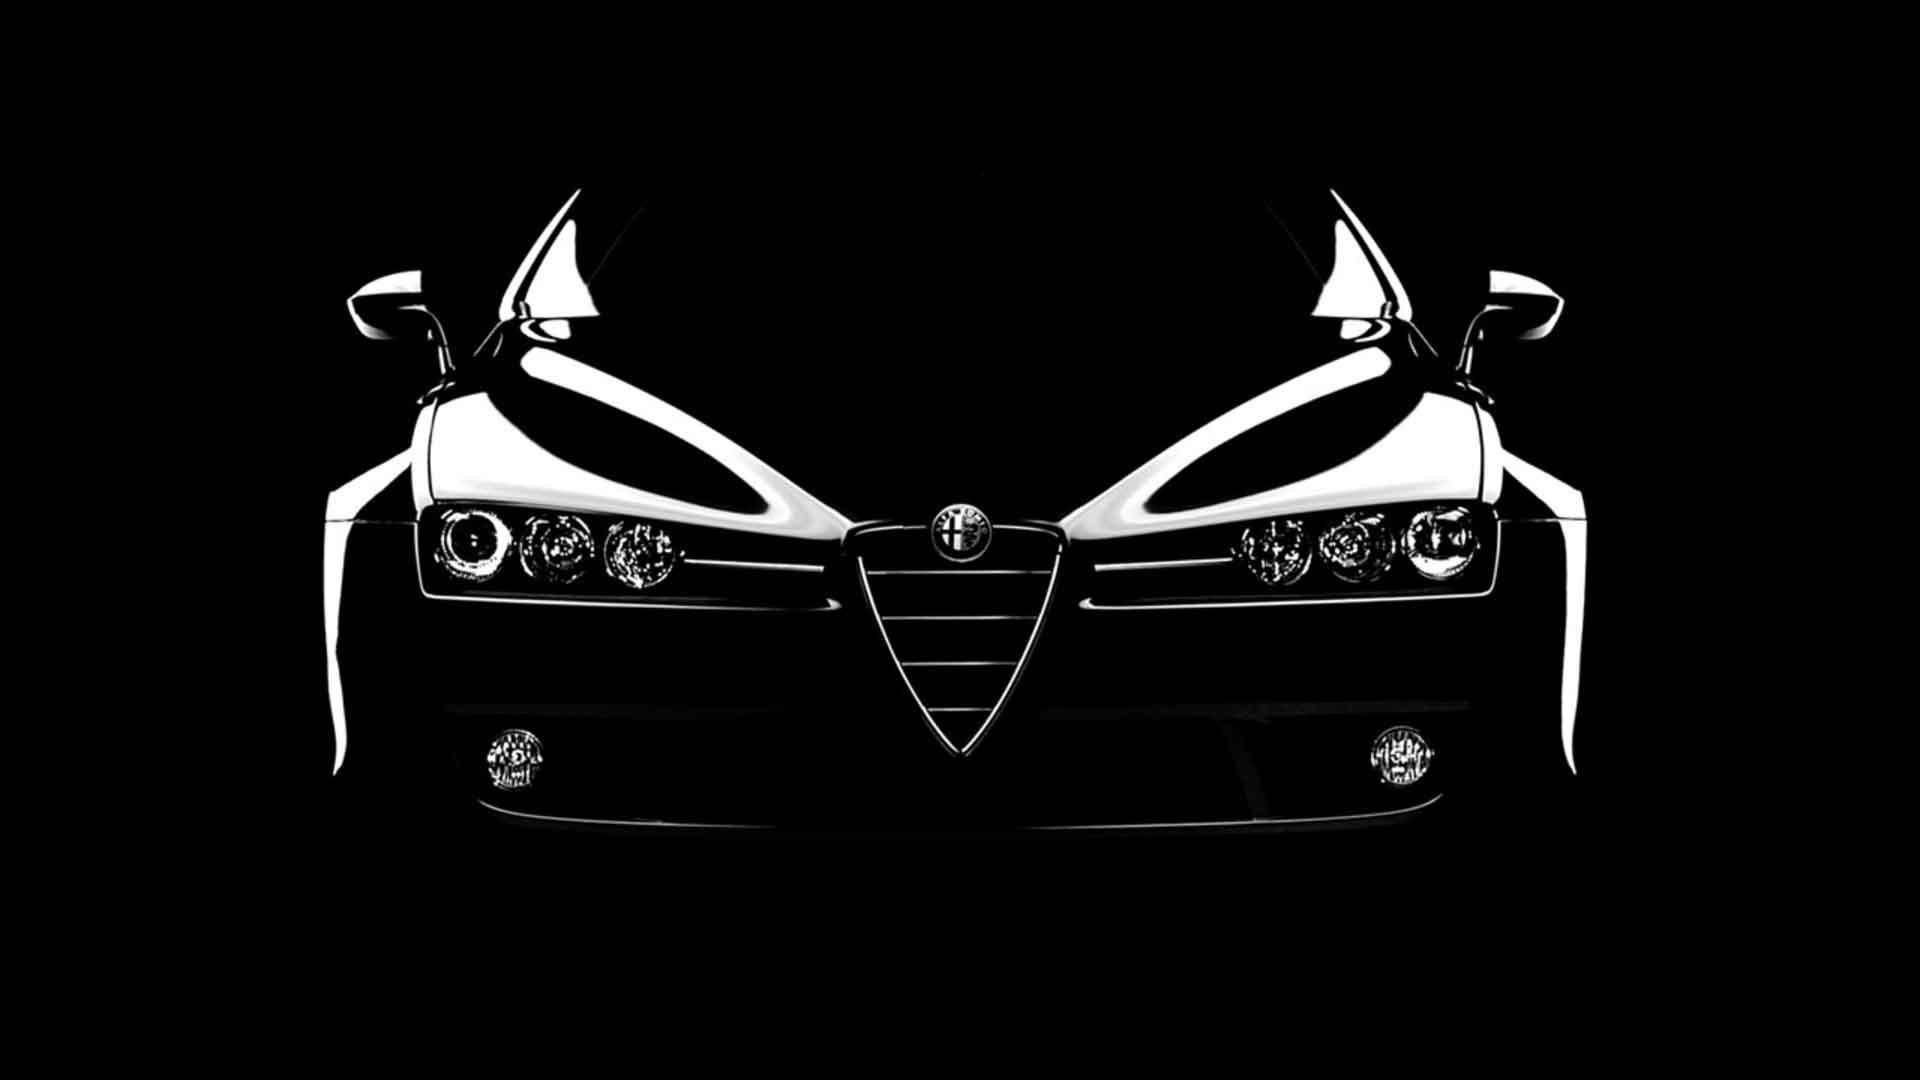 Alfa Romeo Wallpapers Top Free Alfa Romeo Backgrounds Wallpaperaccess